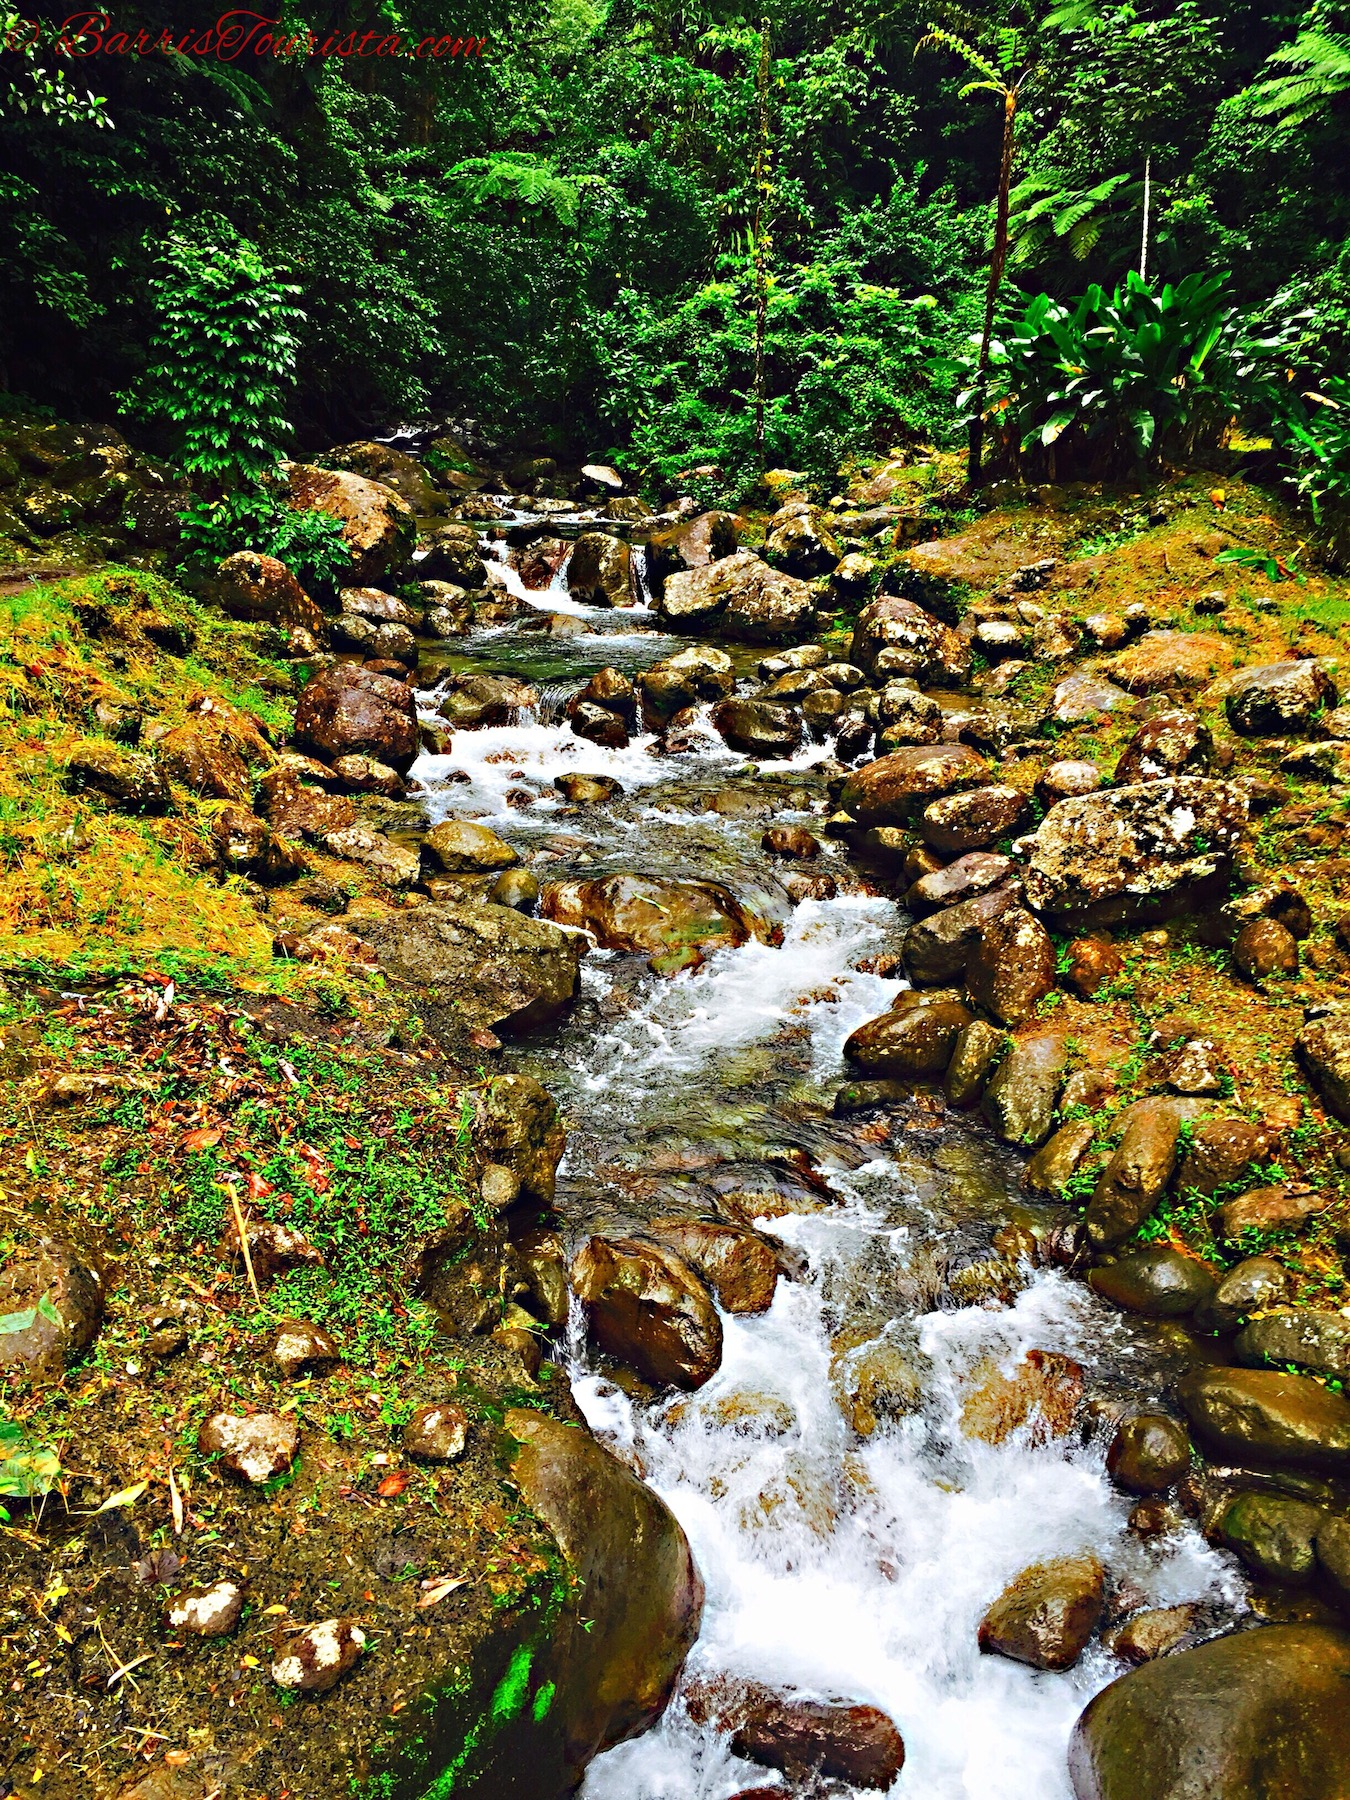 BarrisTourista-Martinique Waterfall karambole tours